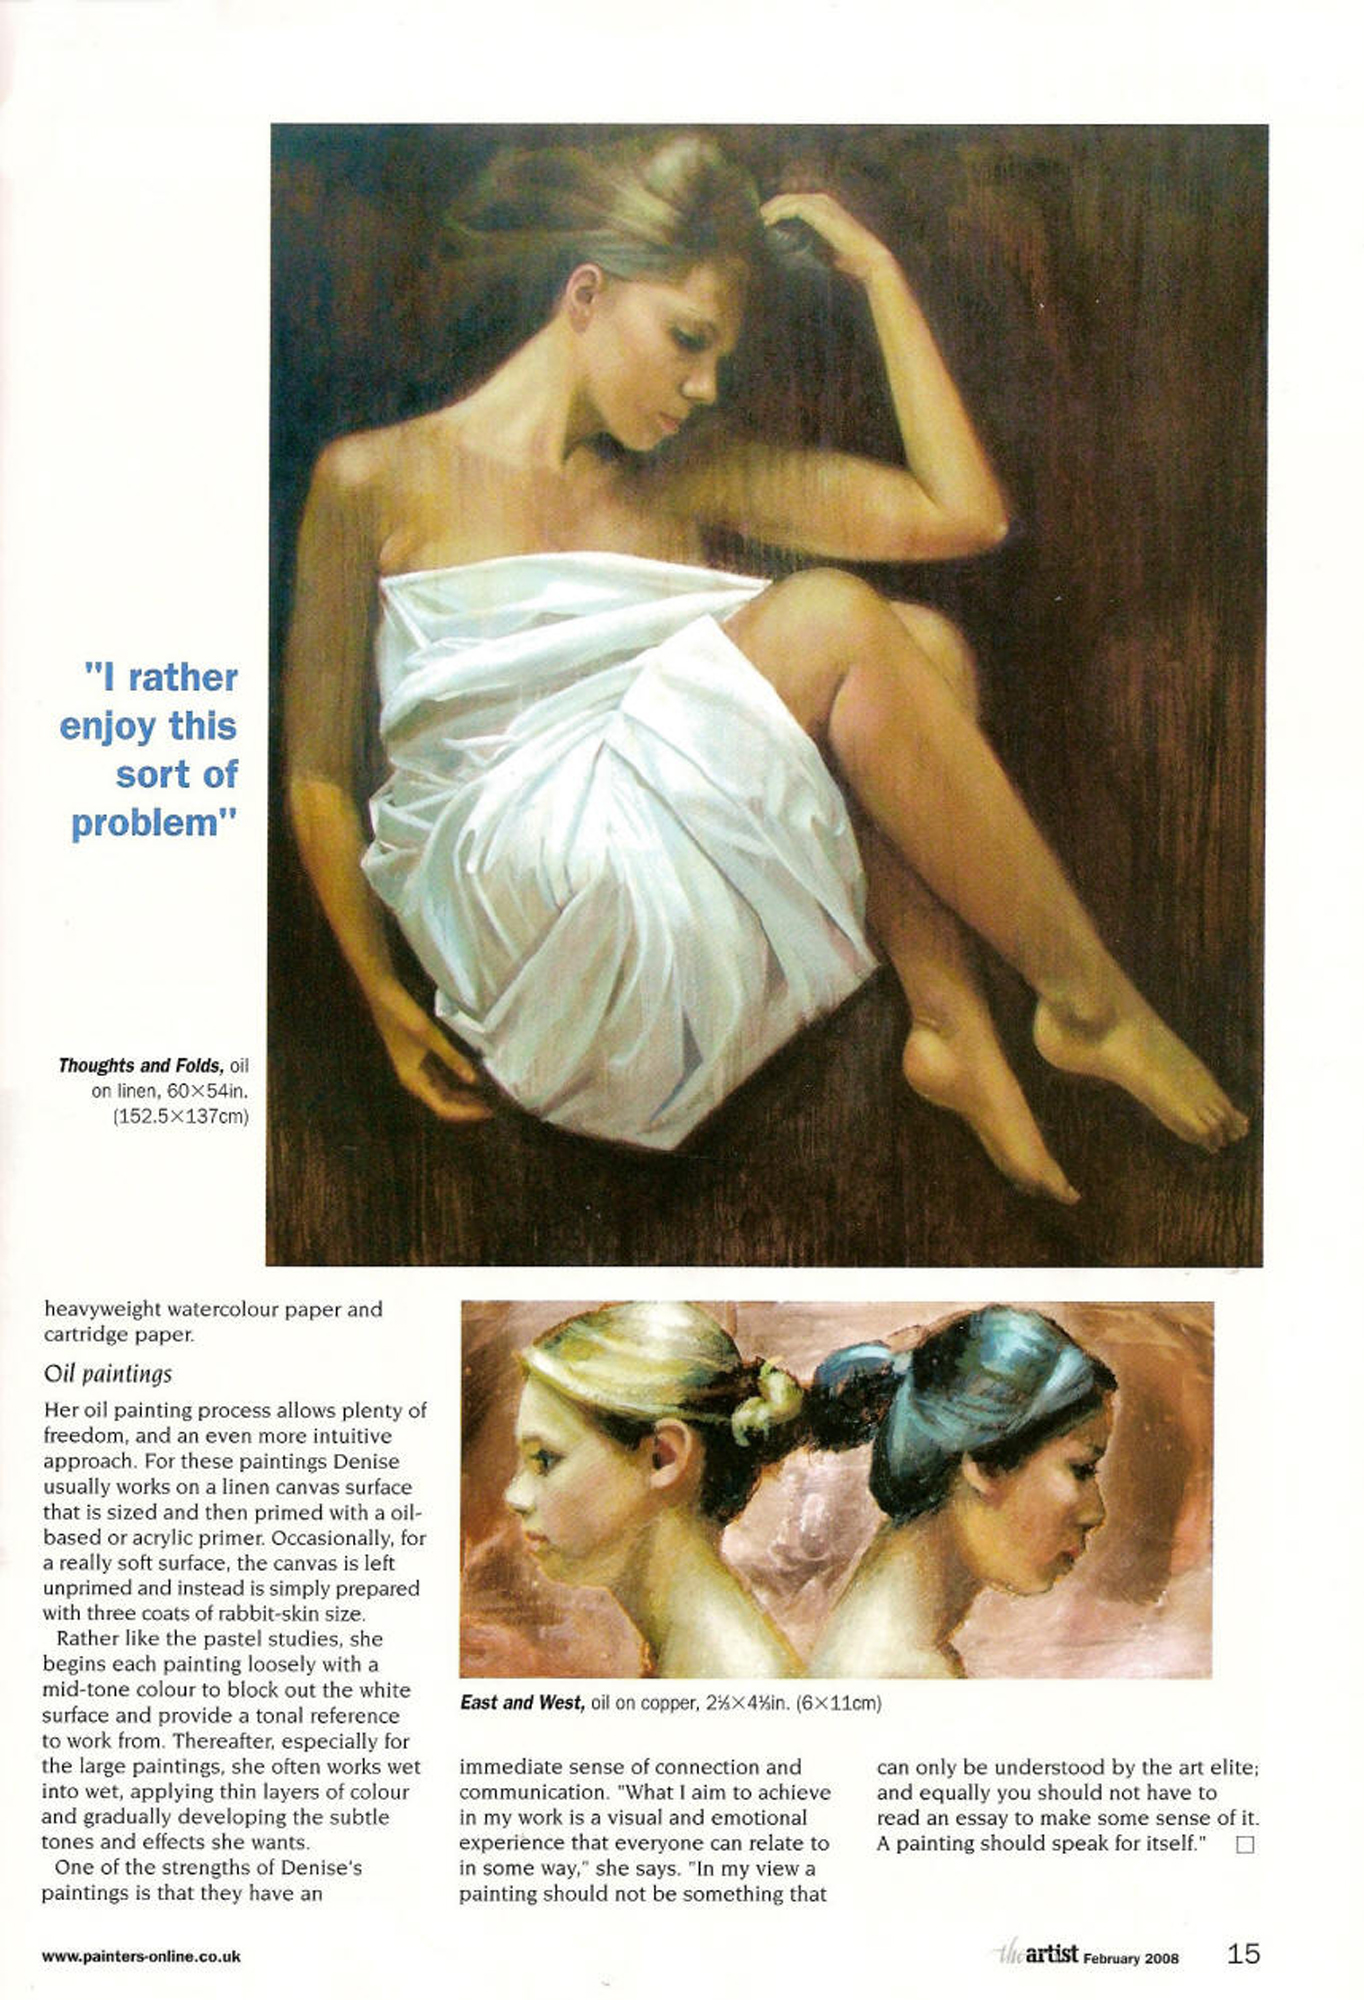 The Artist, February 2008, p.4